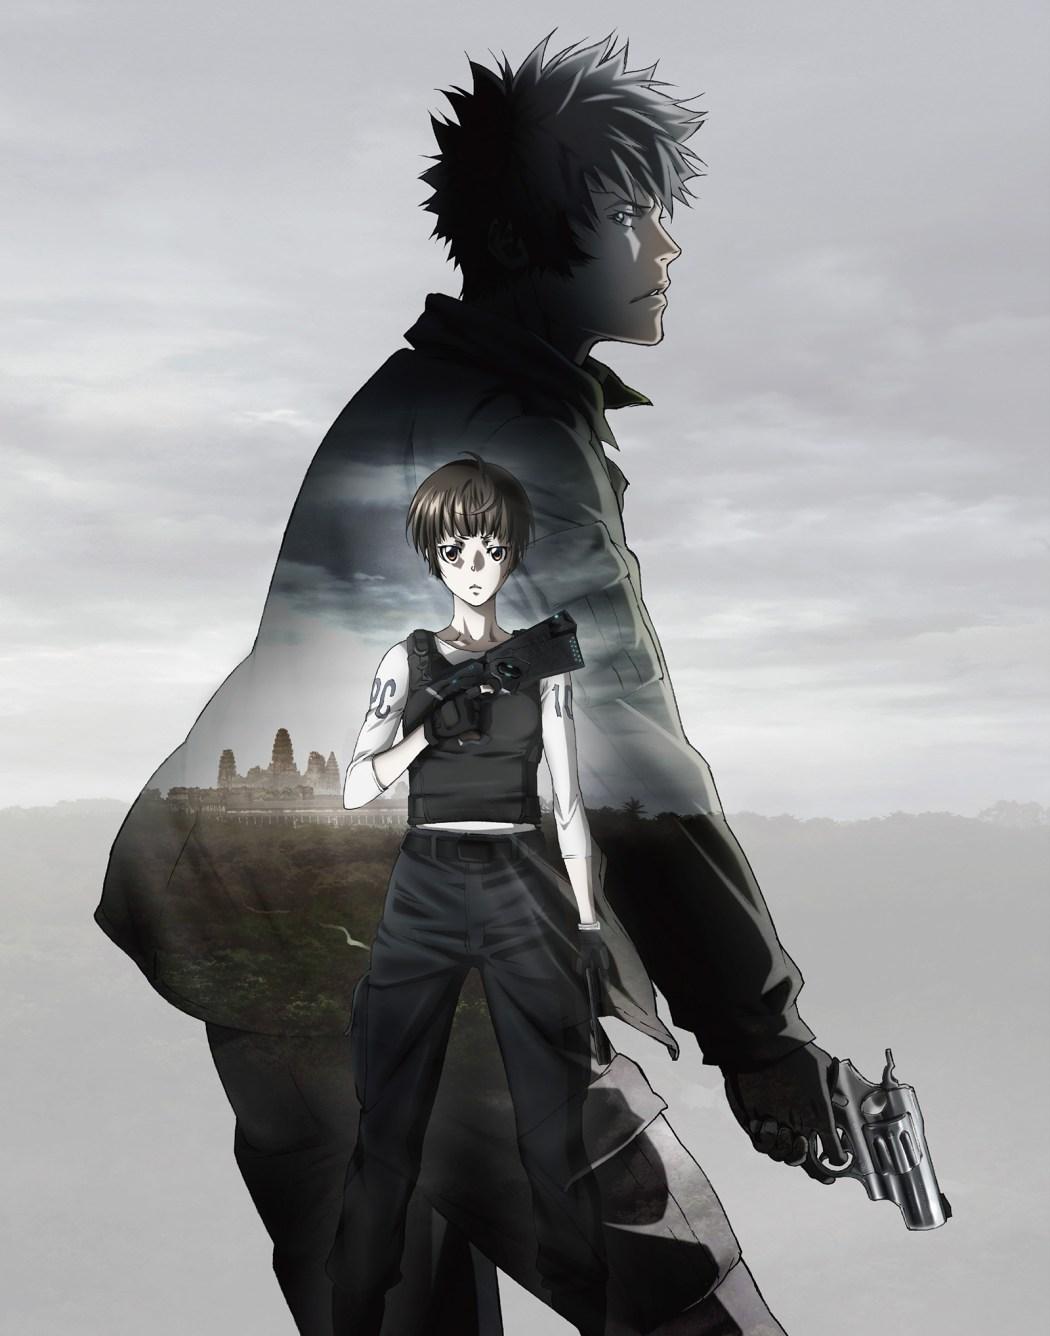 Psycho-Pass-Movie-Second-Visual-haruhichan.com-psycho-pass-anime-movie visual